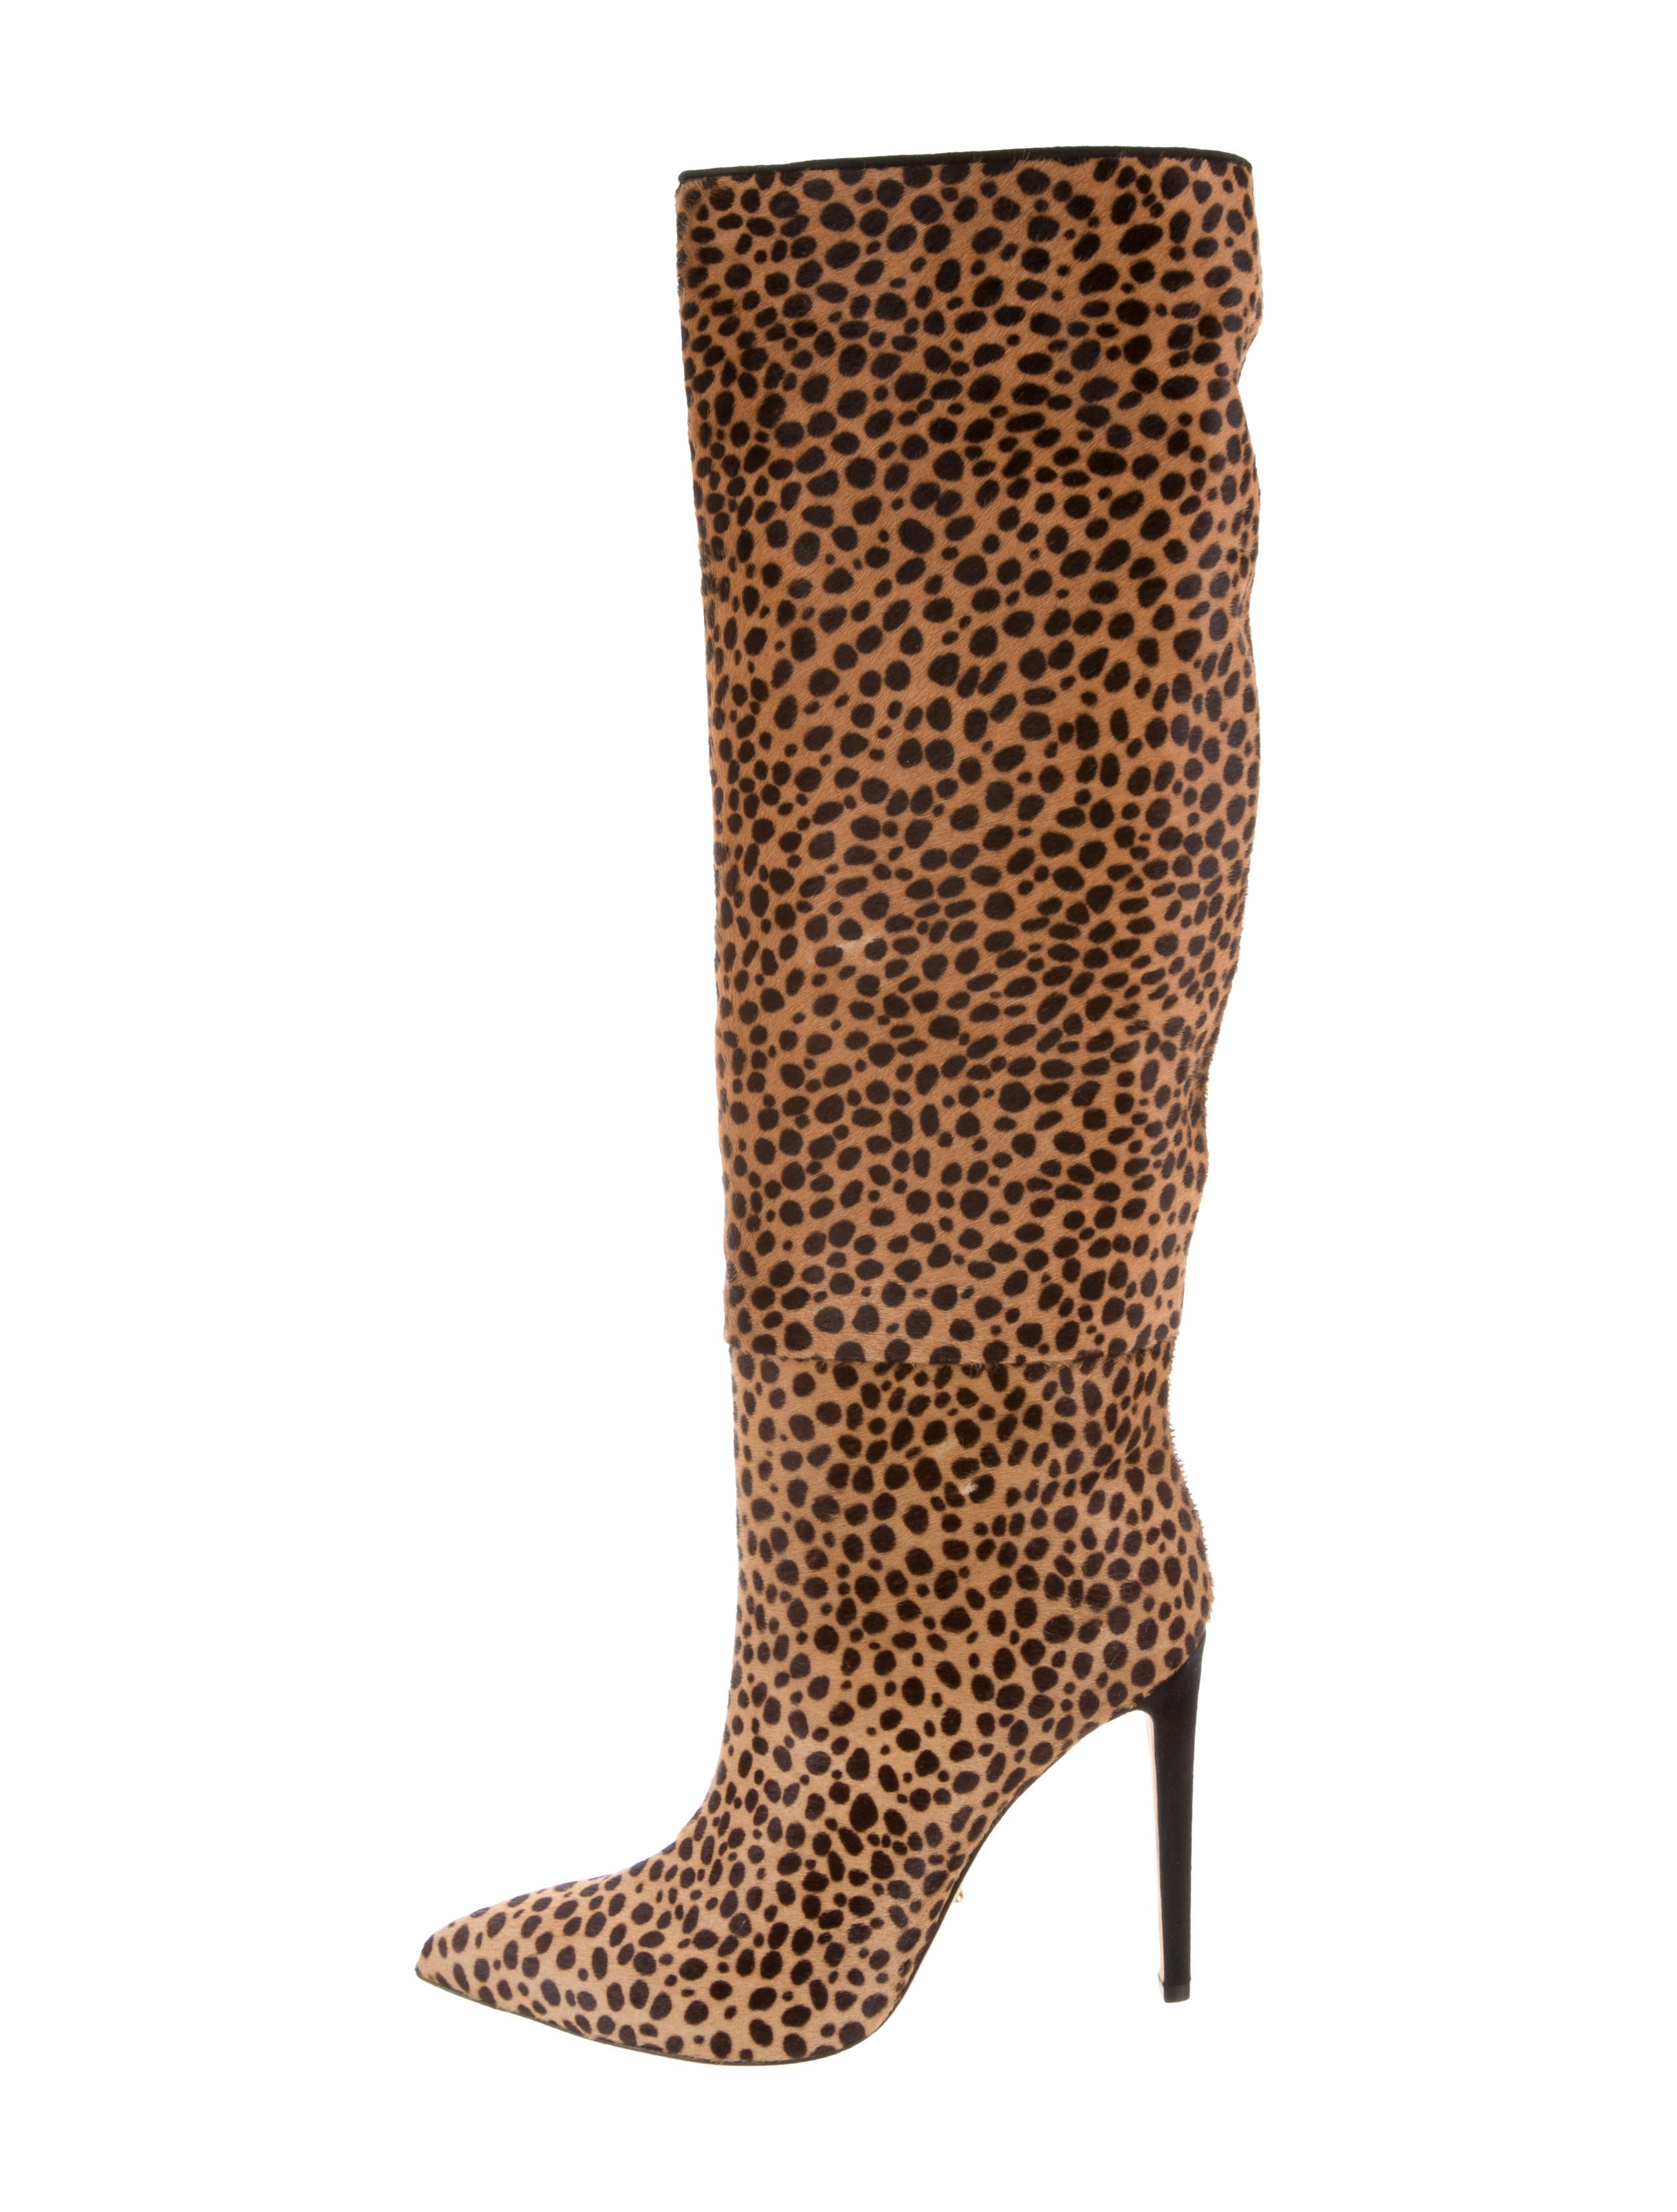 Sergio Rossi Matrix Ponyhair Boots w/ Tags sale amazing price discount big discount TVHaZ